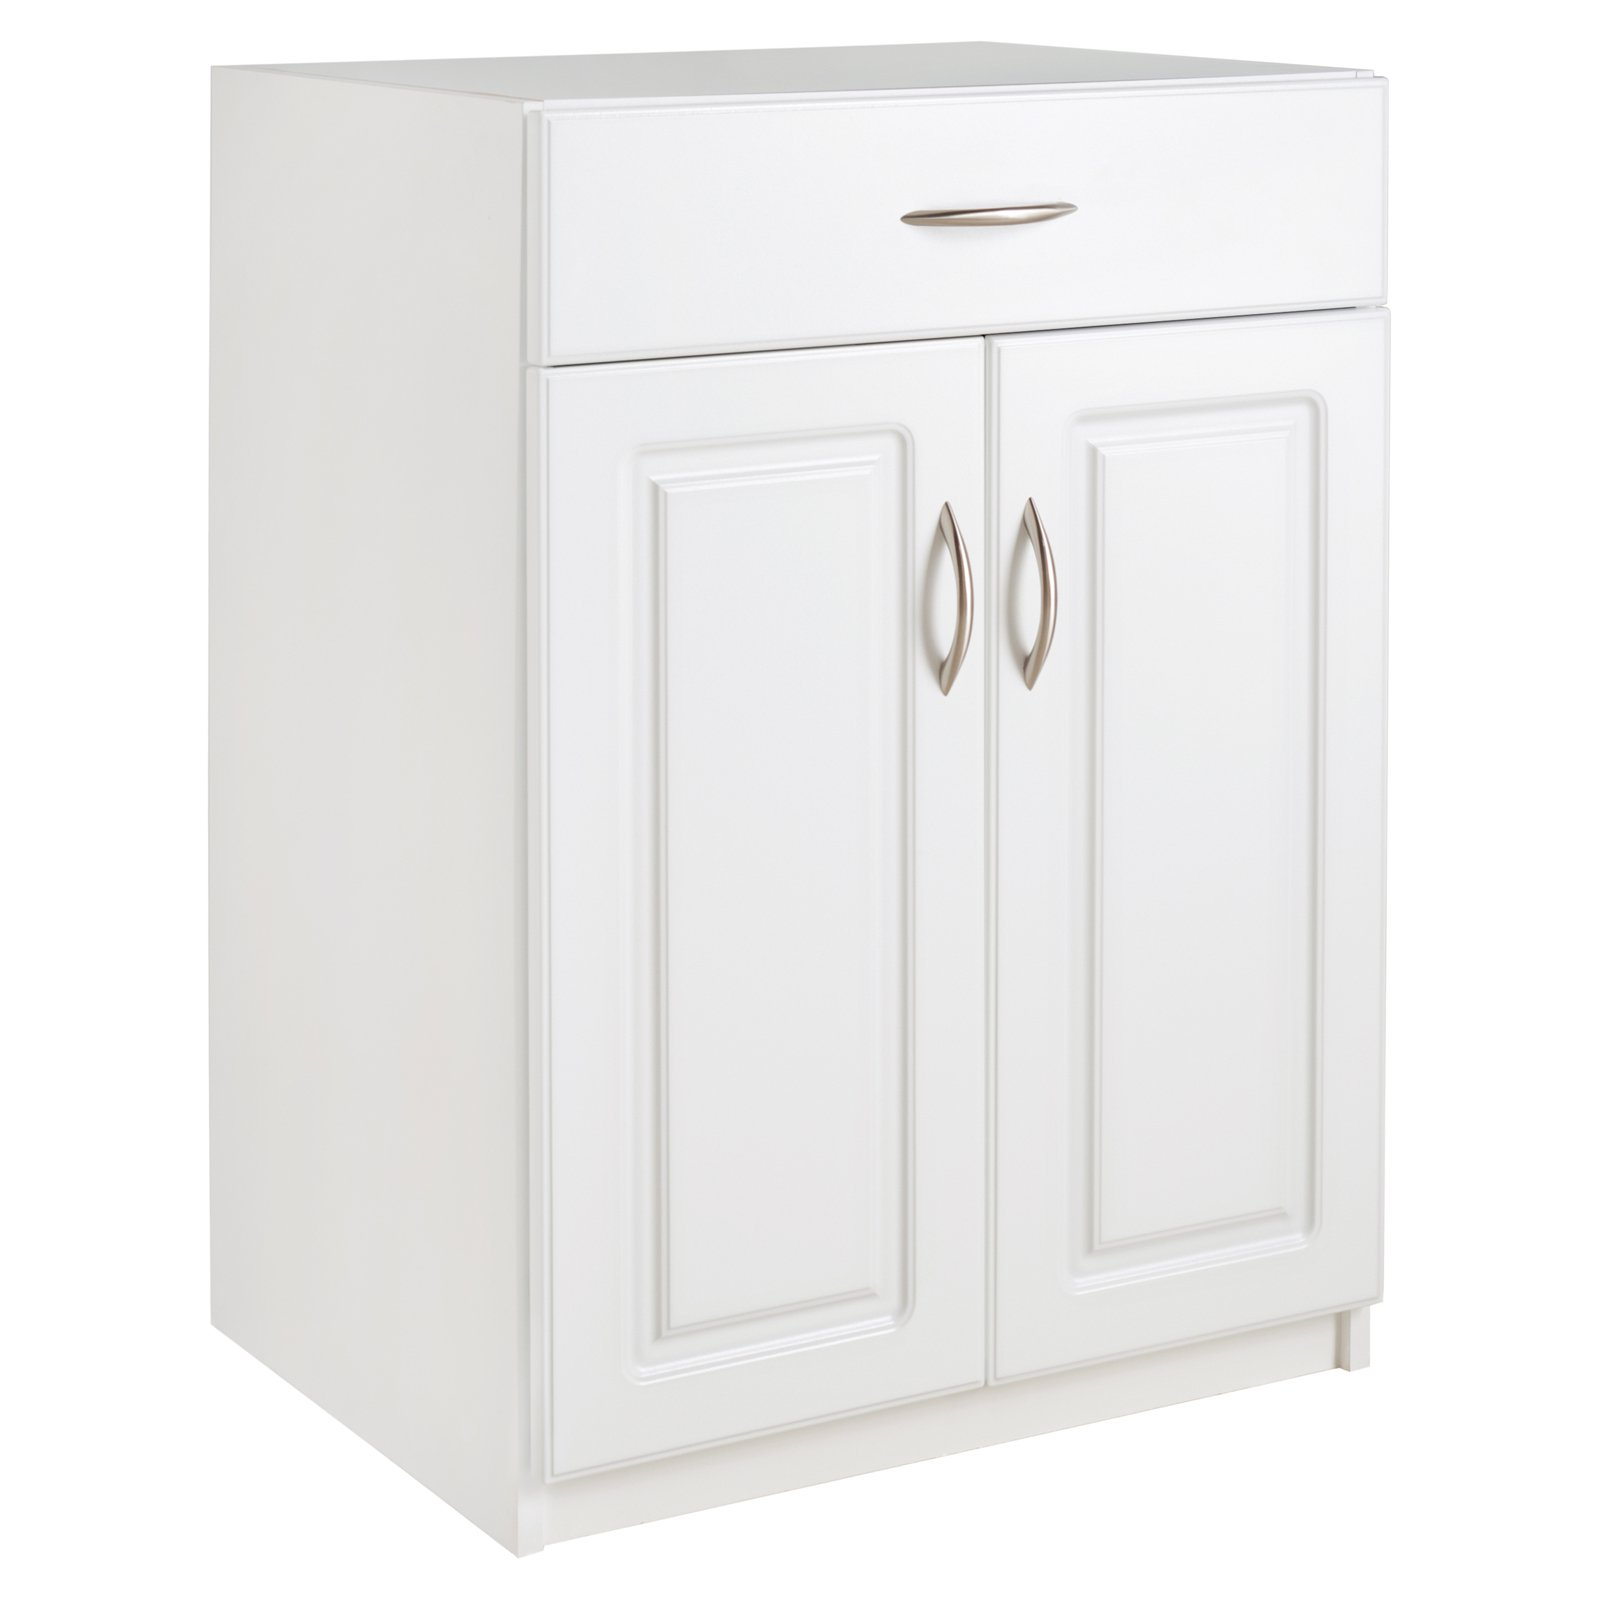 ClosetMaid Dimensions 2 Door Base Cabinet  Walmartcom